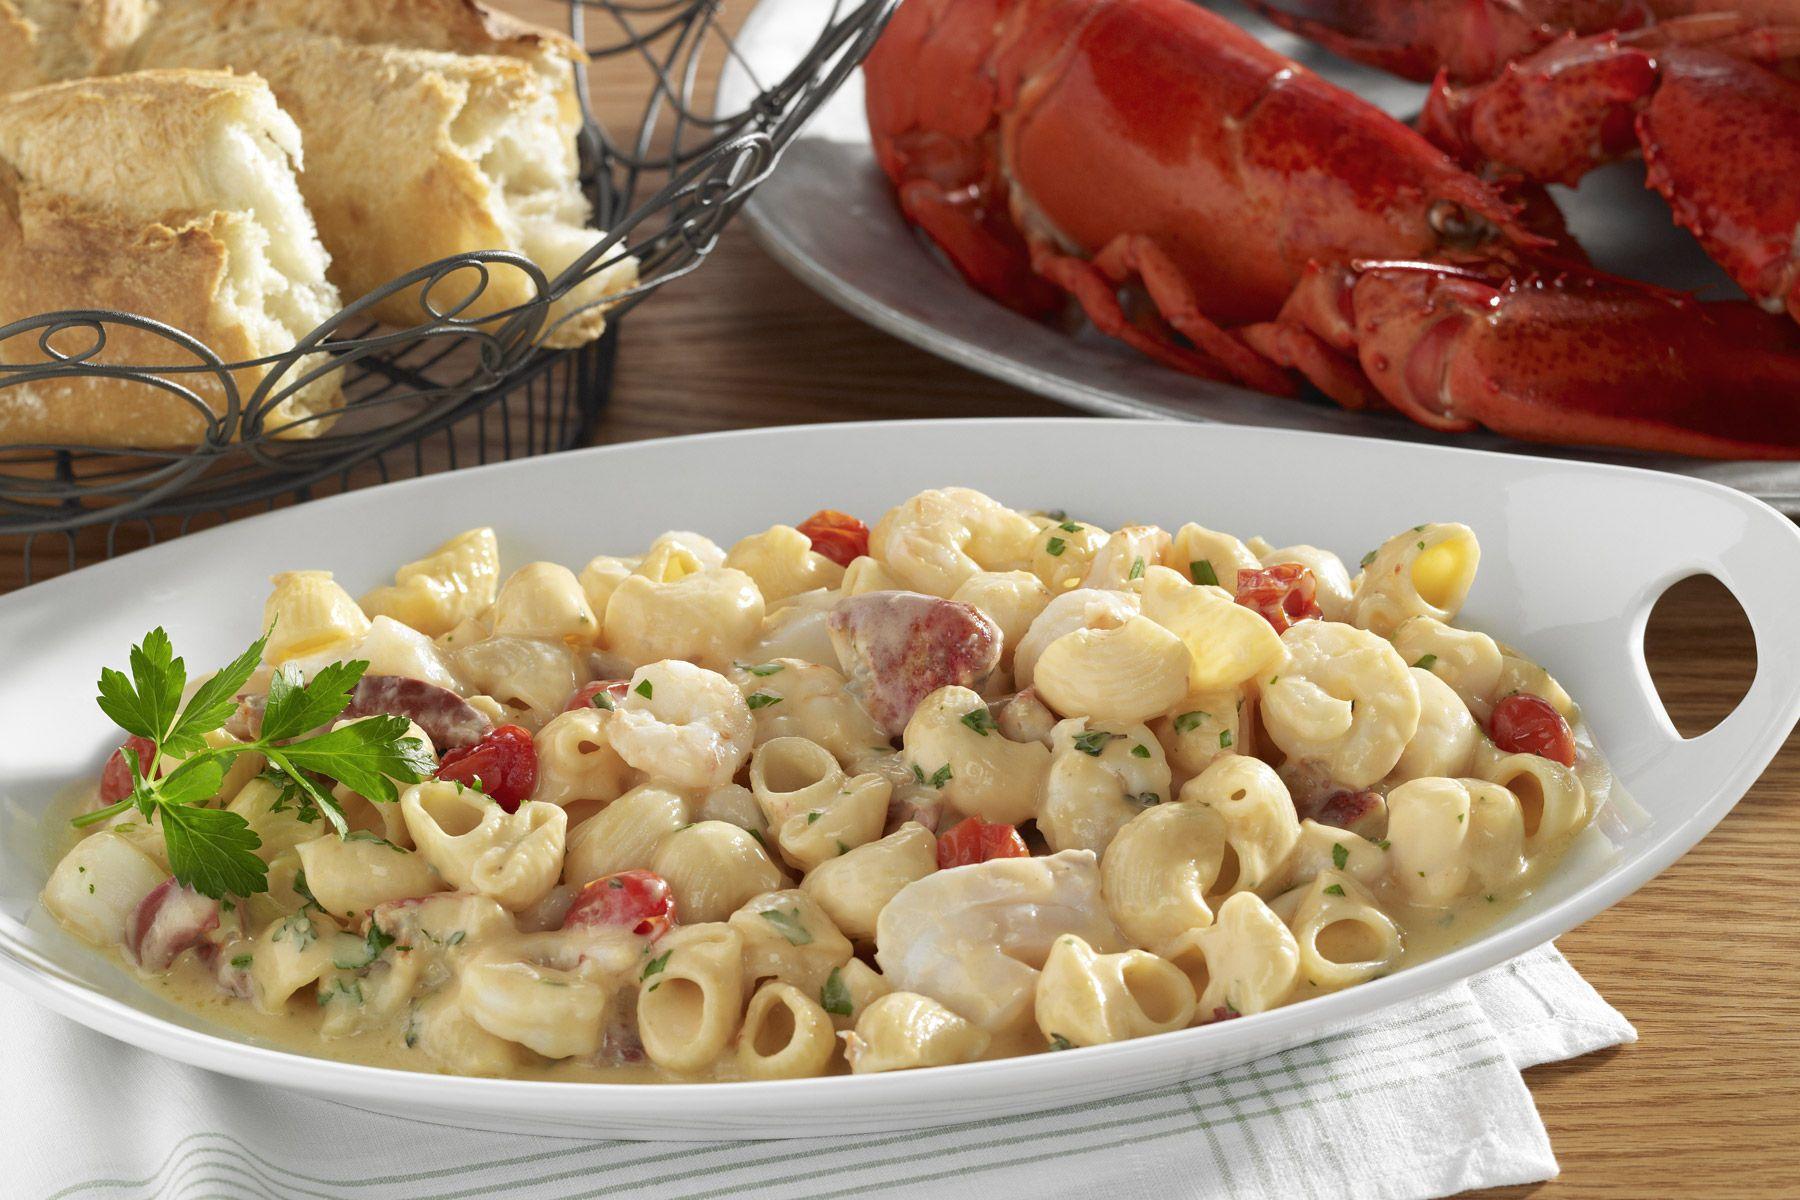 Bar Harbor Foods Lobster Mac & Cheese